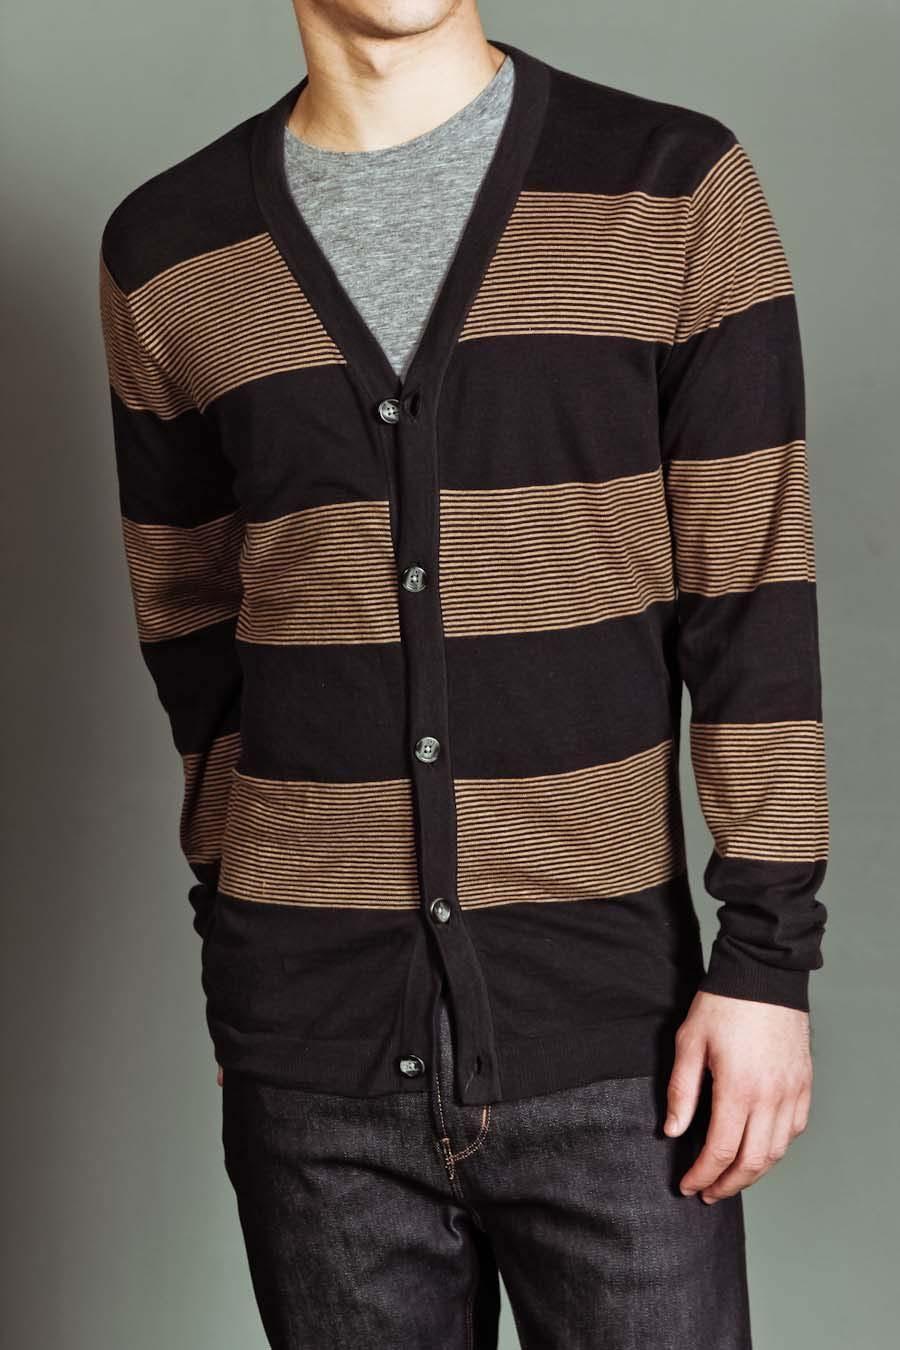 Cardigan Sweater Dark Navy | Casual Man | Pinterest | Man style ...